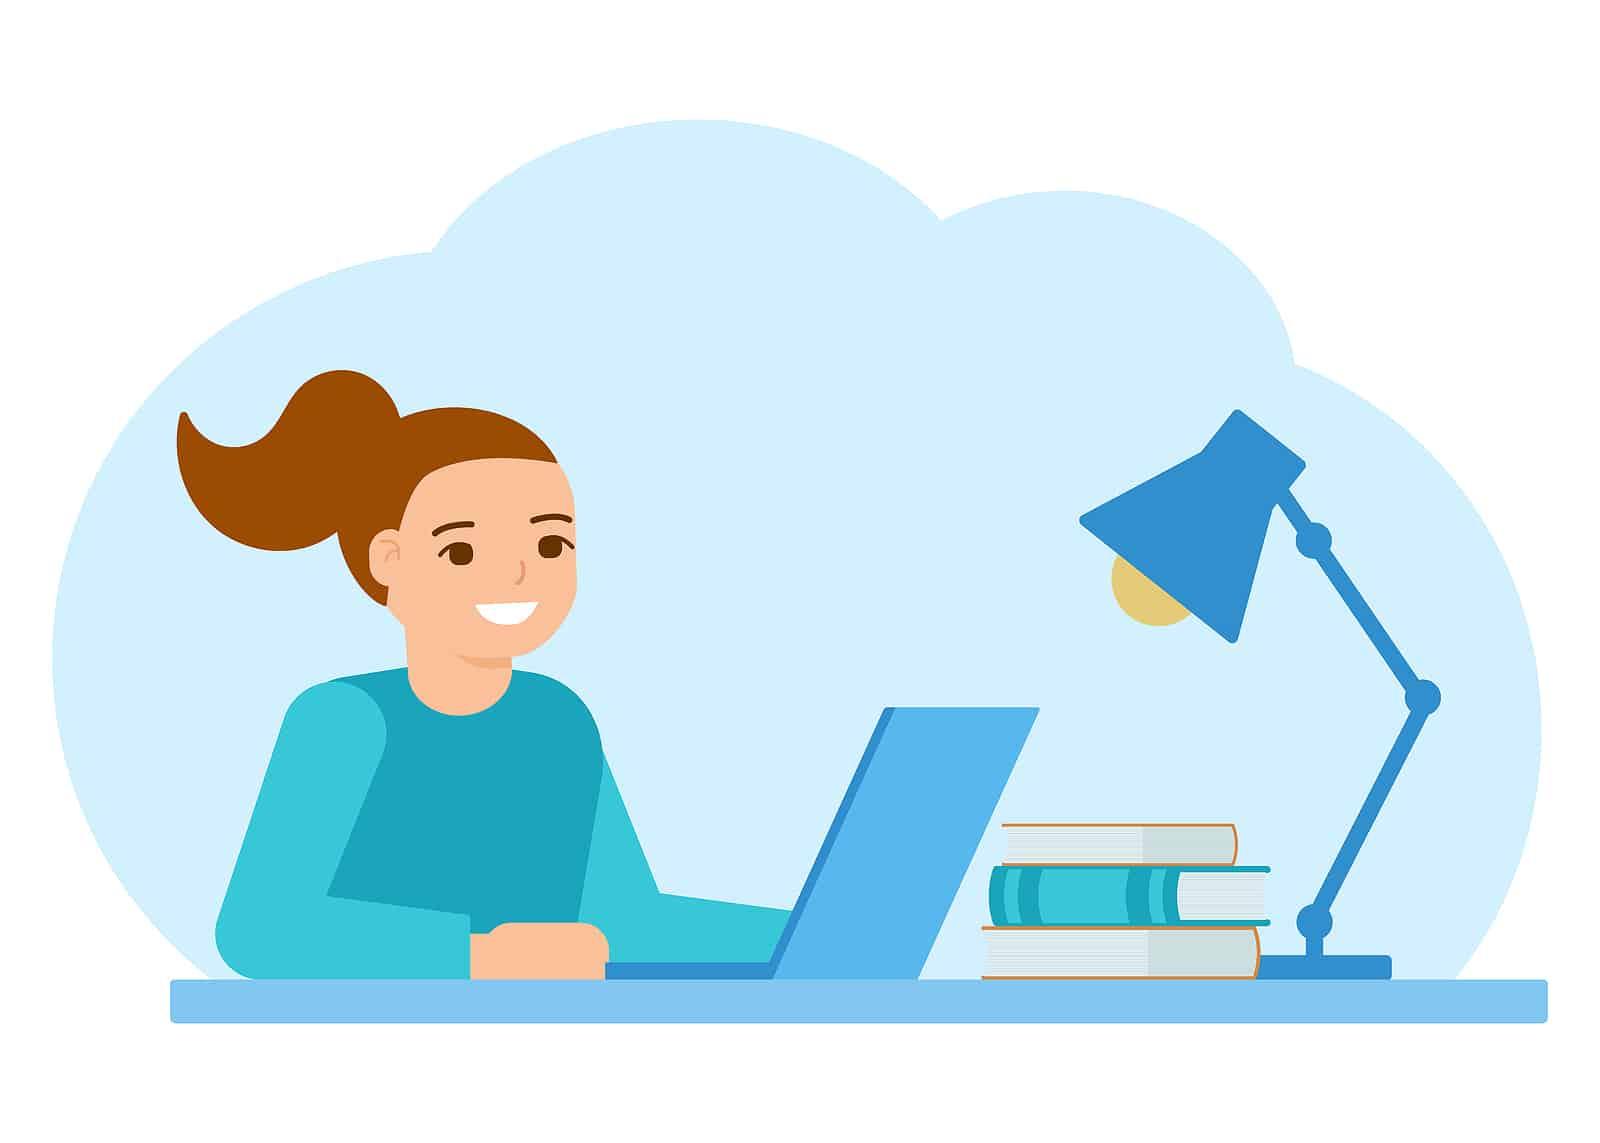 Illustration of girl studying at a desk